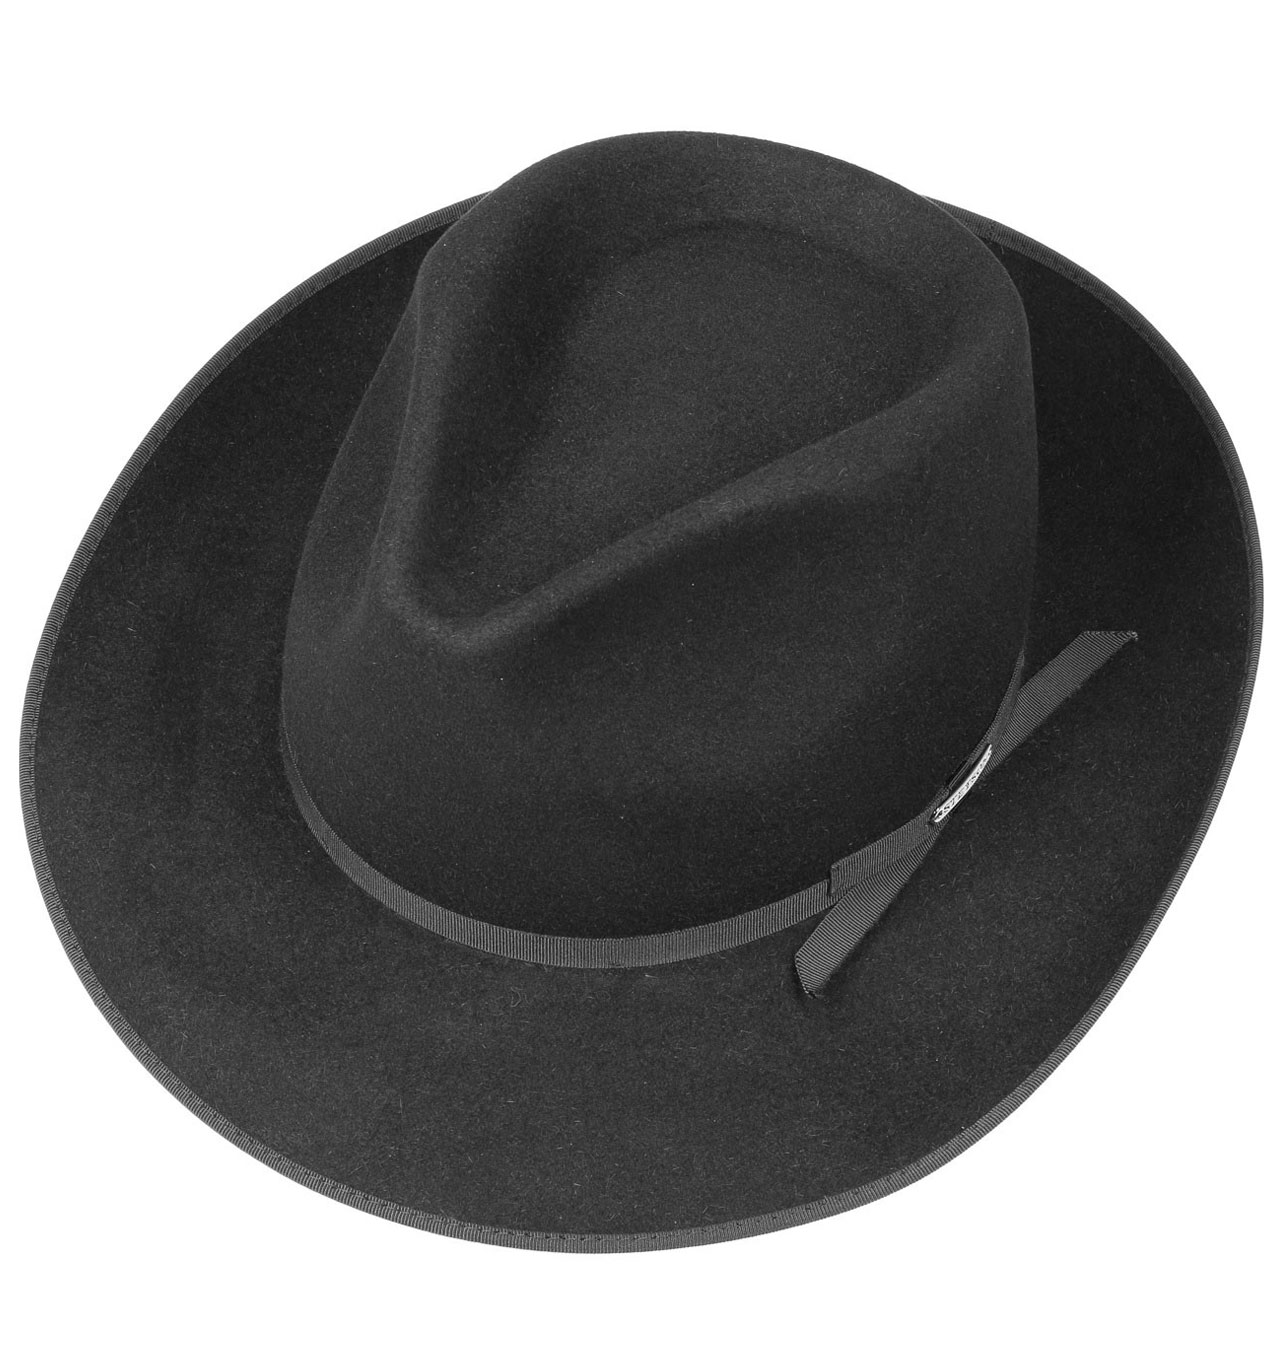 345d5c80f4ad2 Stetson - Stratoliner Fedora Fur Felt Hat - Black